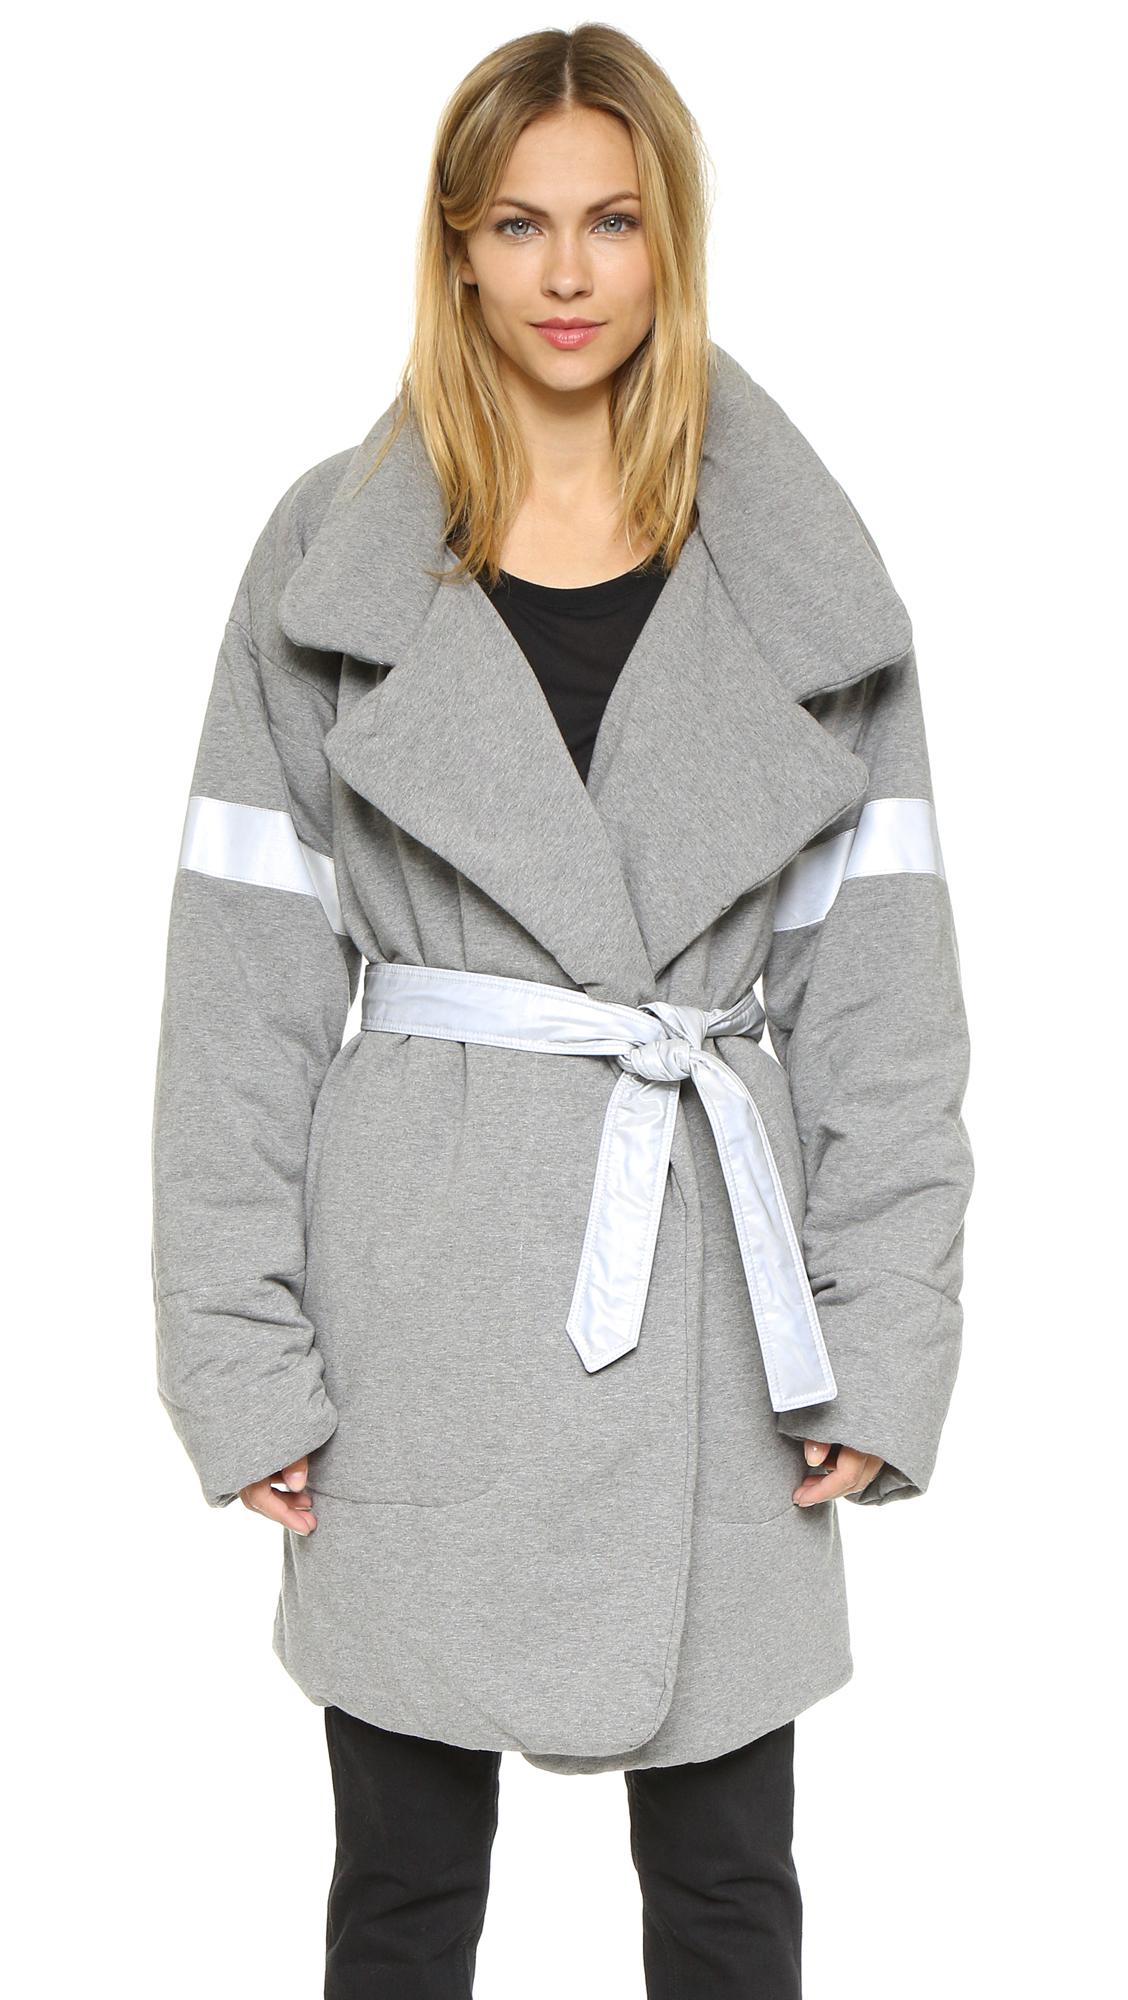 Norma Kamali Reversible Quilted Sleeping Bag Coat Black